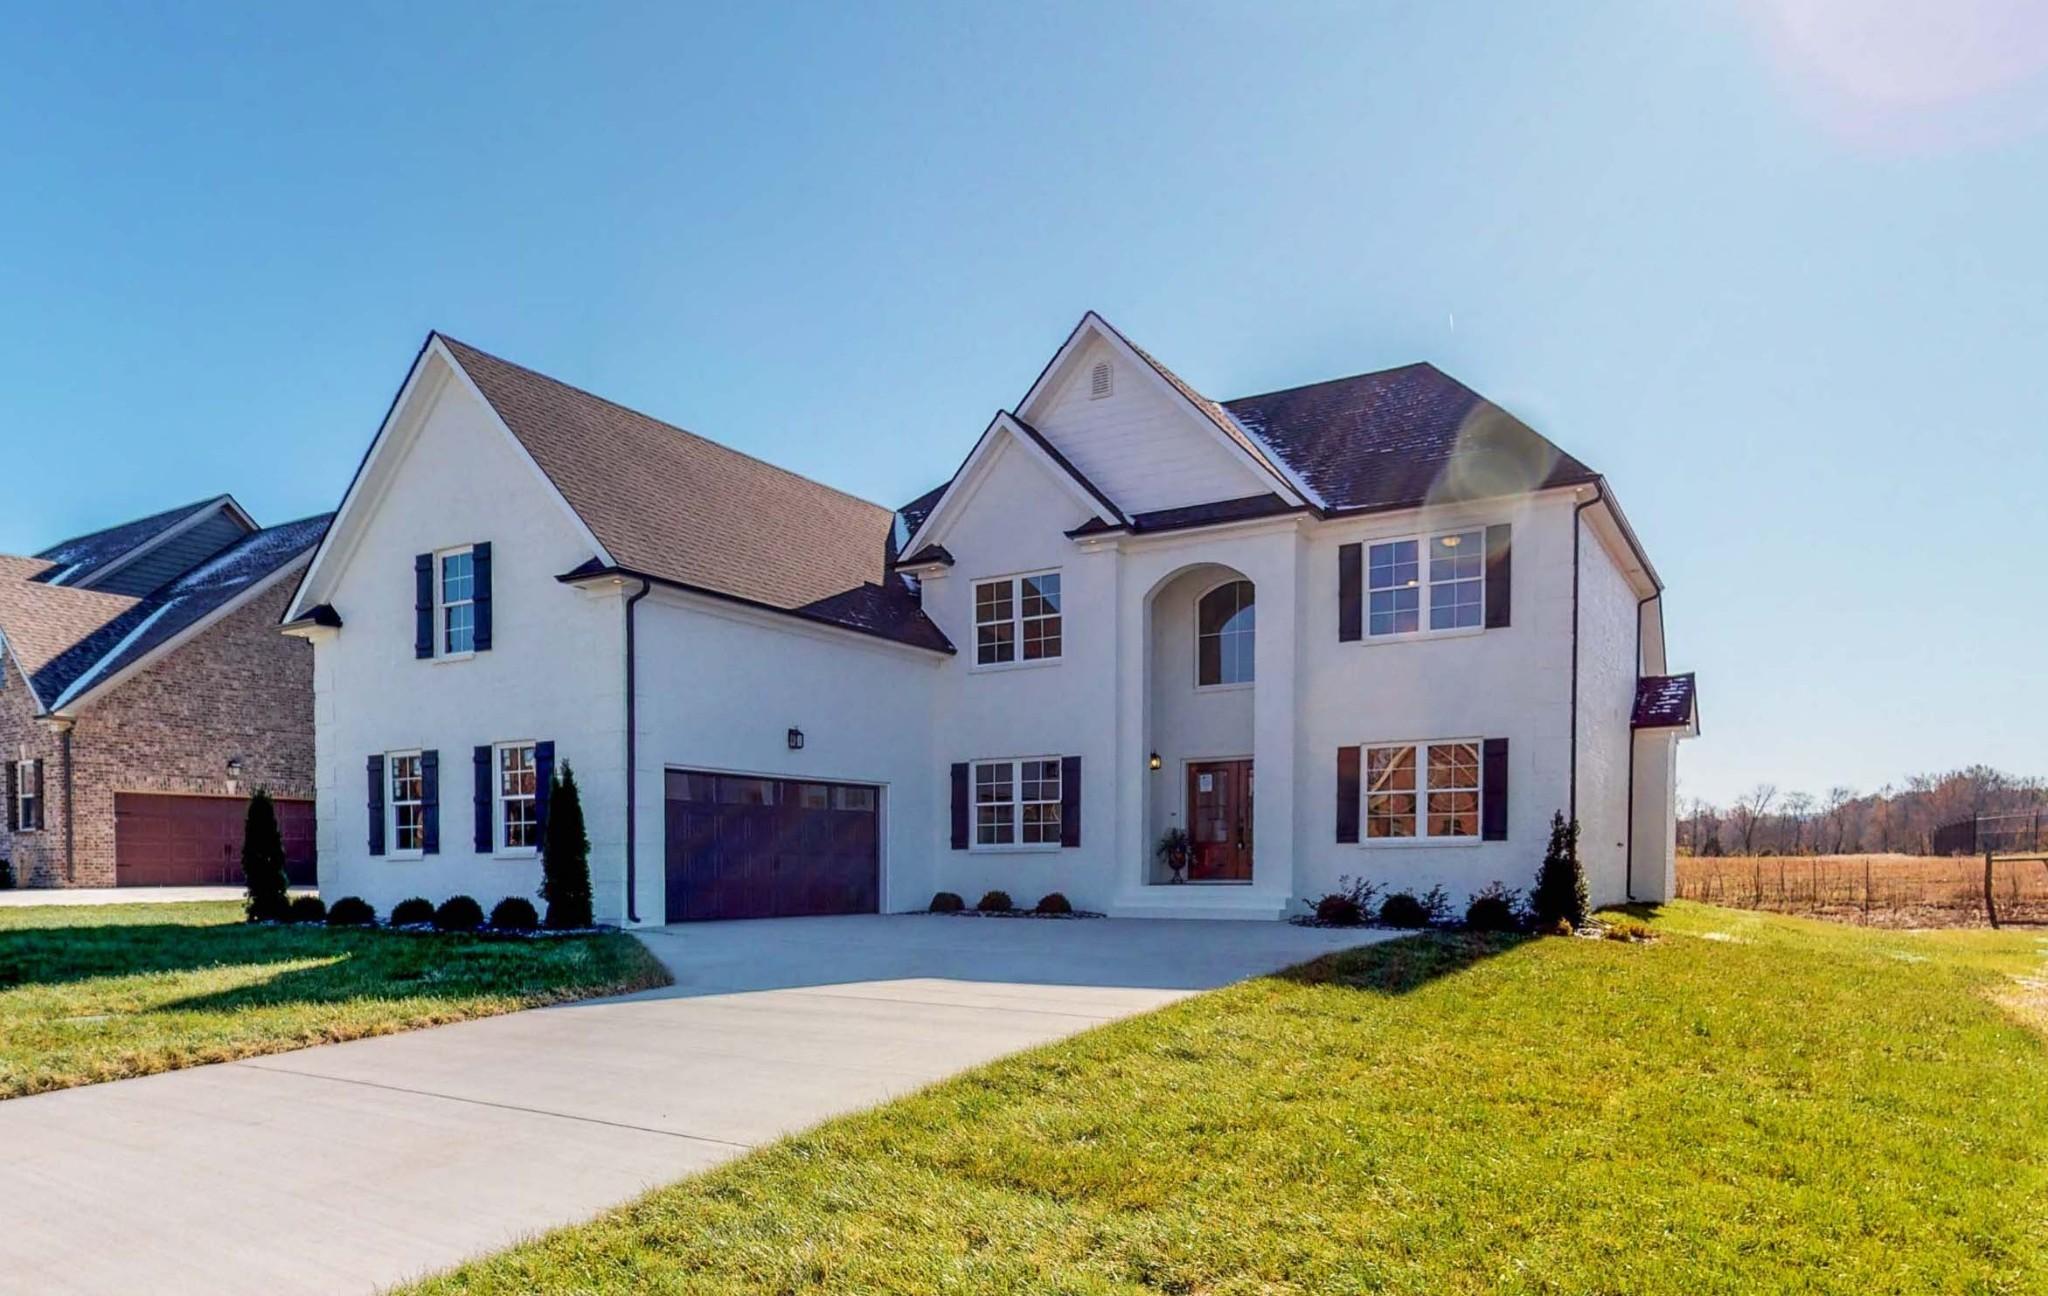 7029 Harriswood Ln, Murfreesboro, TN 37129 - Murfreesboro, TN real estate listing